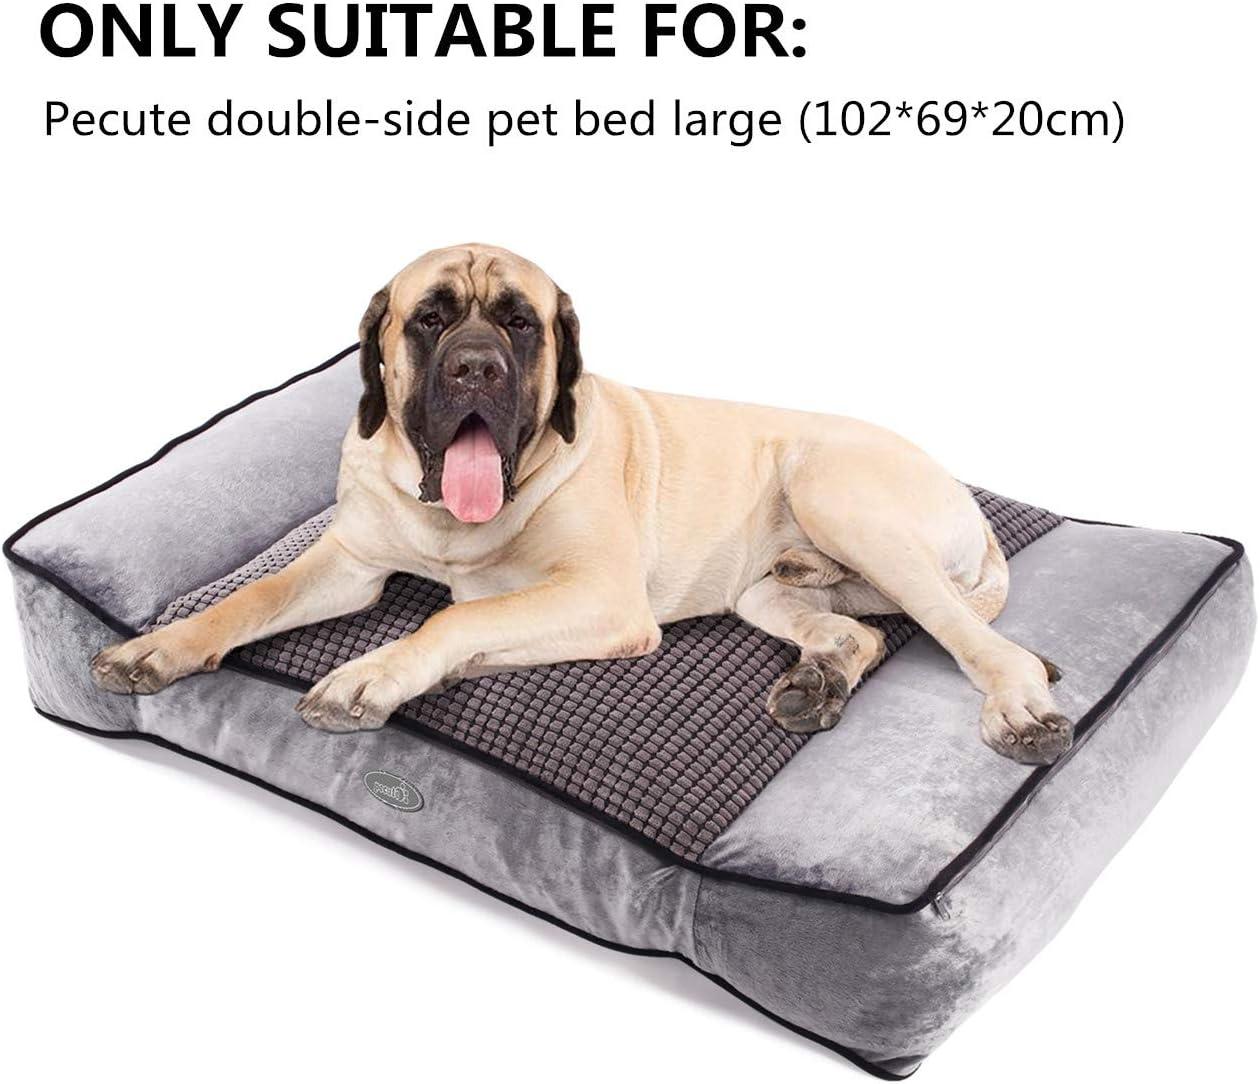 L, Negro Pecute Cubierta deTela de Reemplazo de Cama para Perro Mascotas de Doble Cara